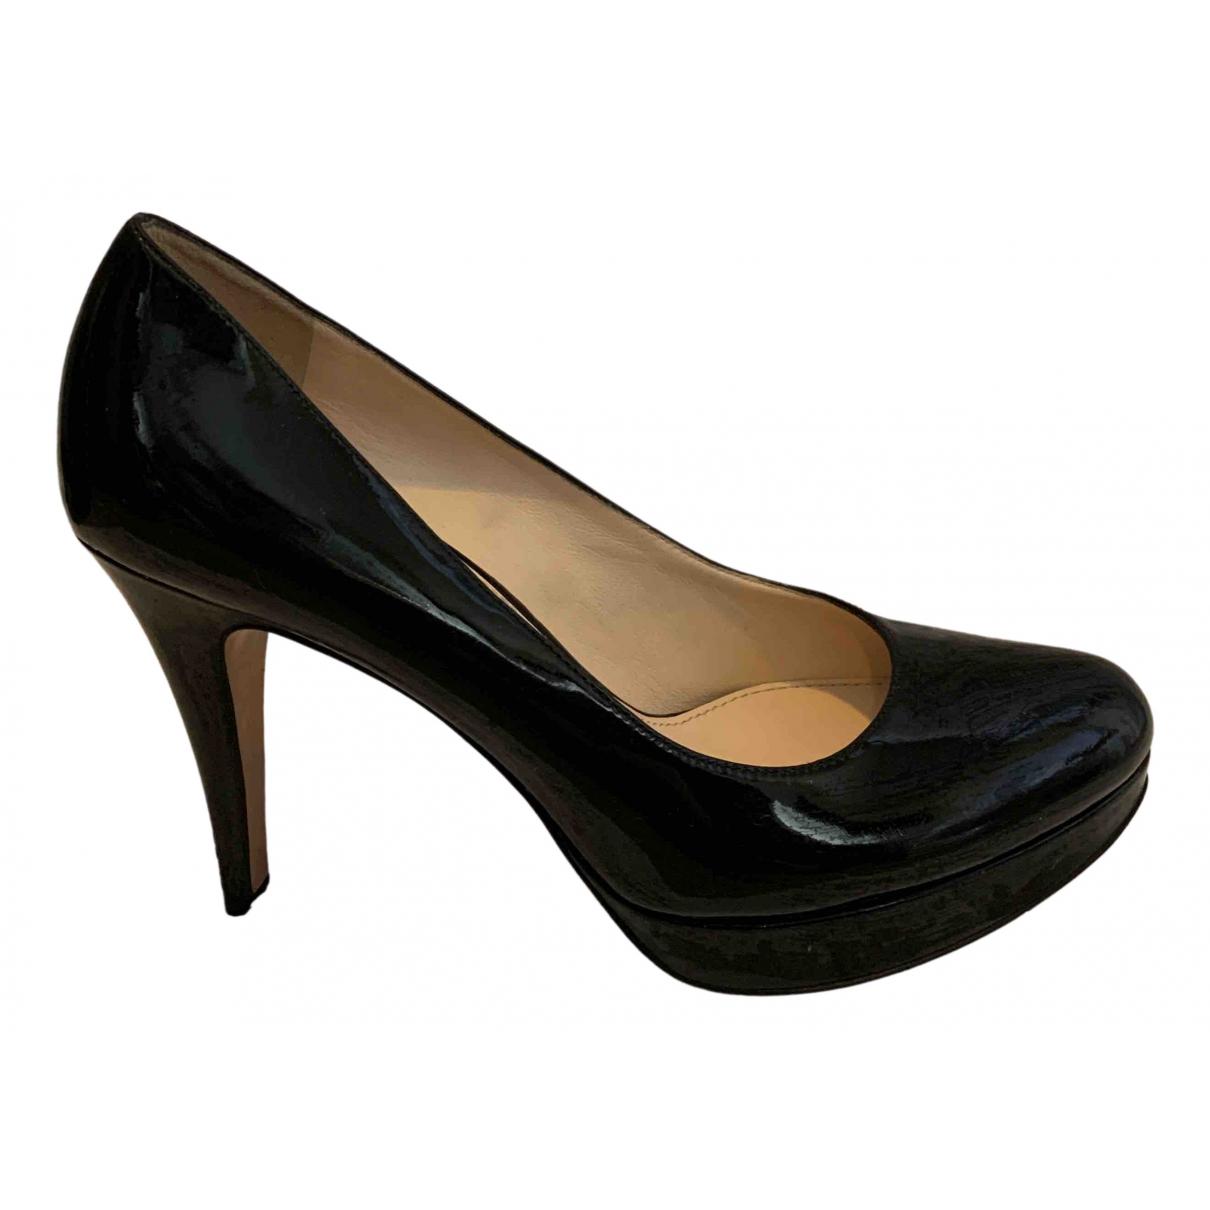 Prada N Black Patent leather Heels for Women 38.5 IT